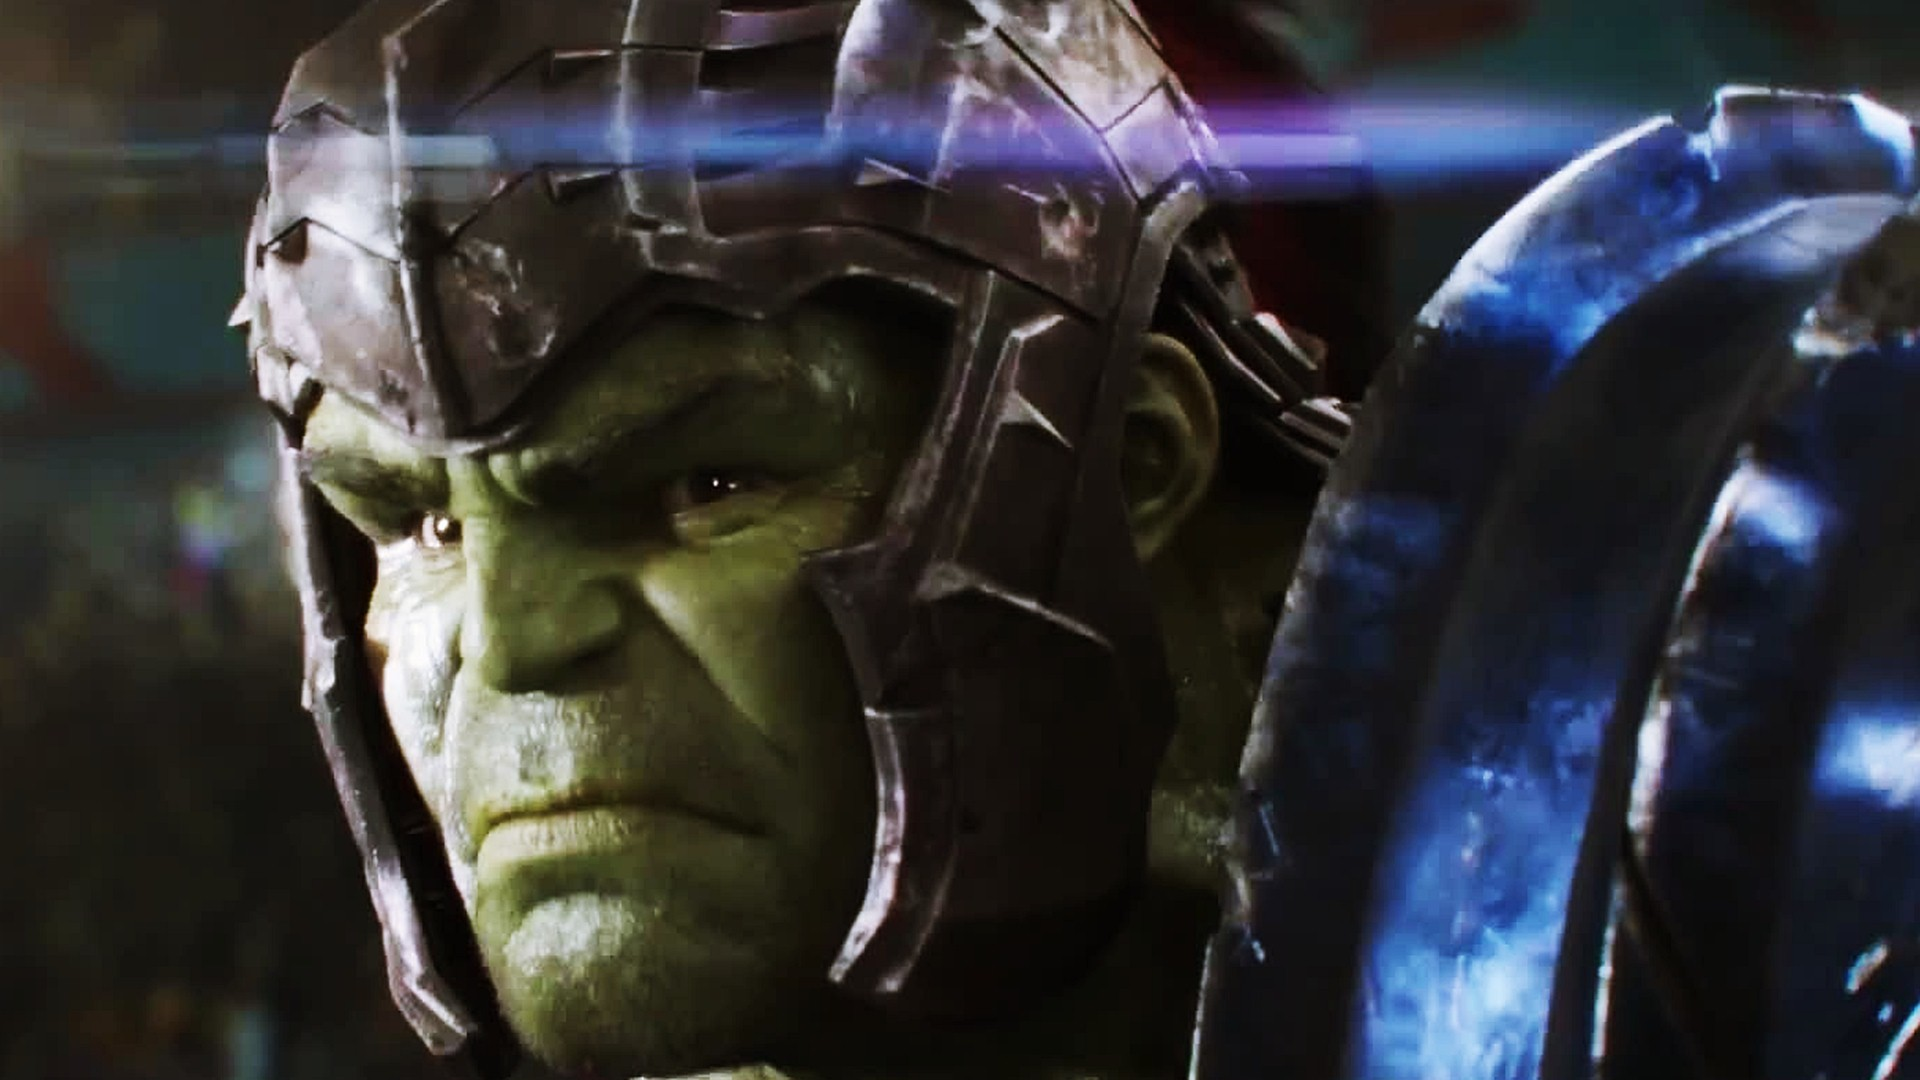 Hd hulk wallpaper 74 images - Hulk hd images free download ...